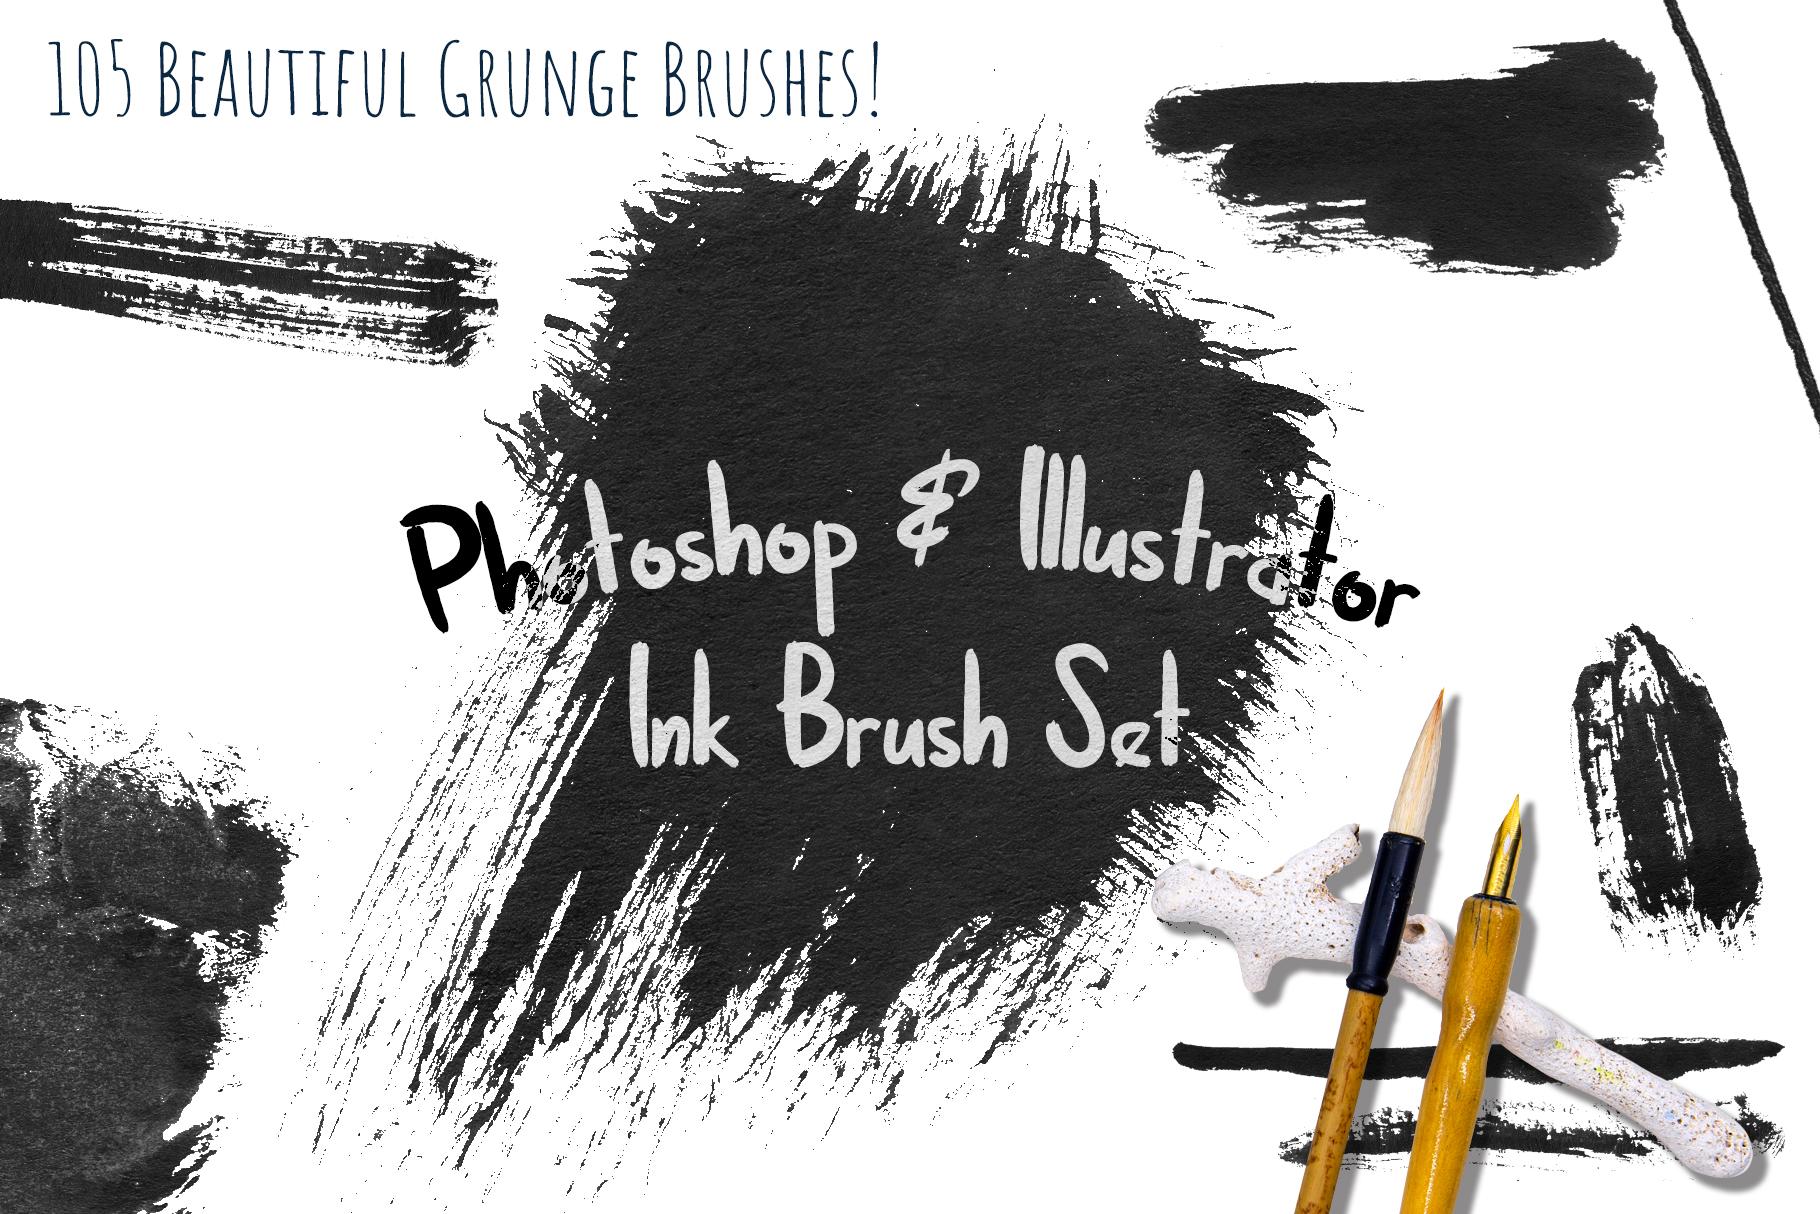 Black Ink Brushes for Adobe Photoshop and Adobe Illustrator example image 1